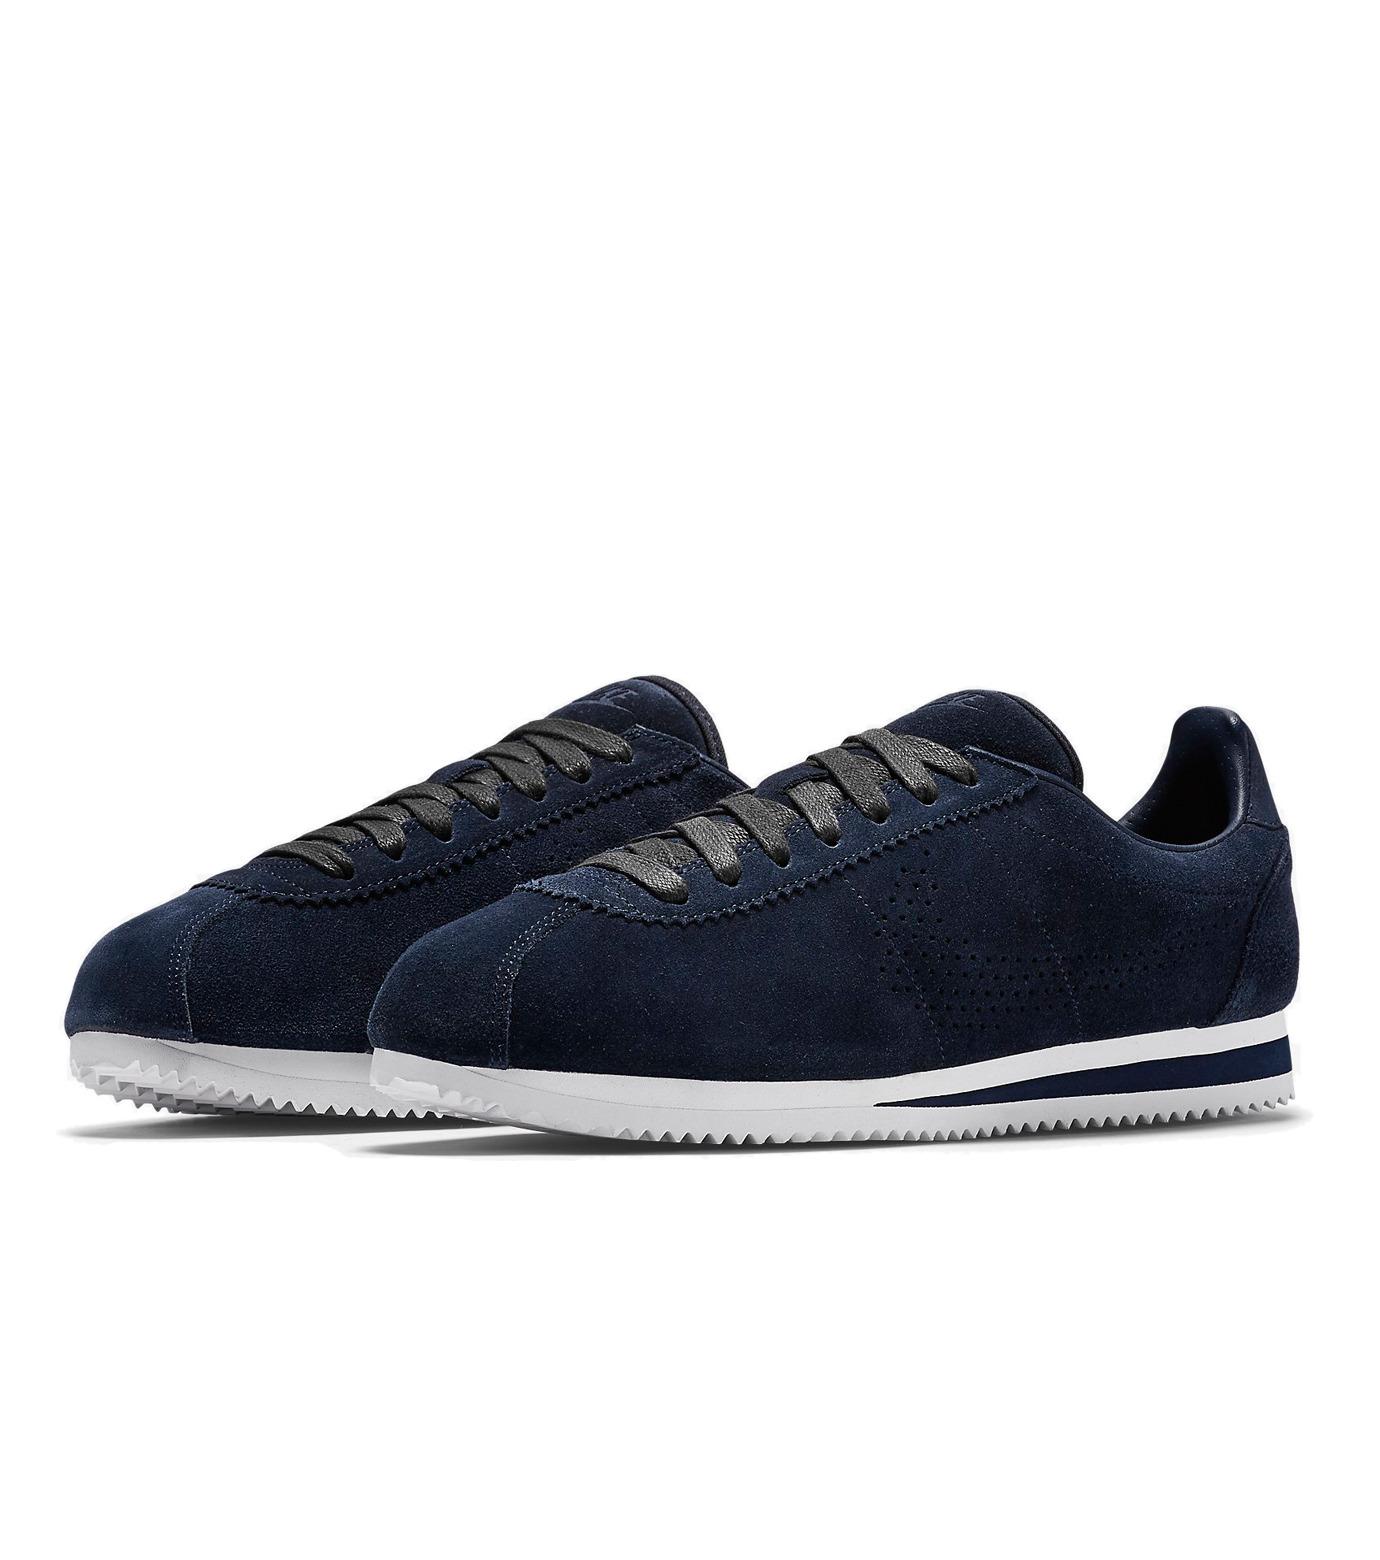 NIKE(ナイキ)のCLASSIC CORTEZ LX-BLUE(シューズ/shoes)-823914-400-92 拡大詳細画像3